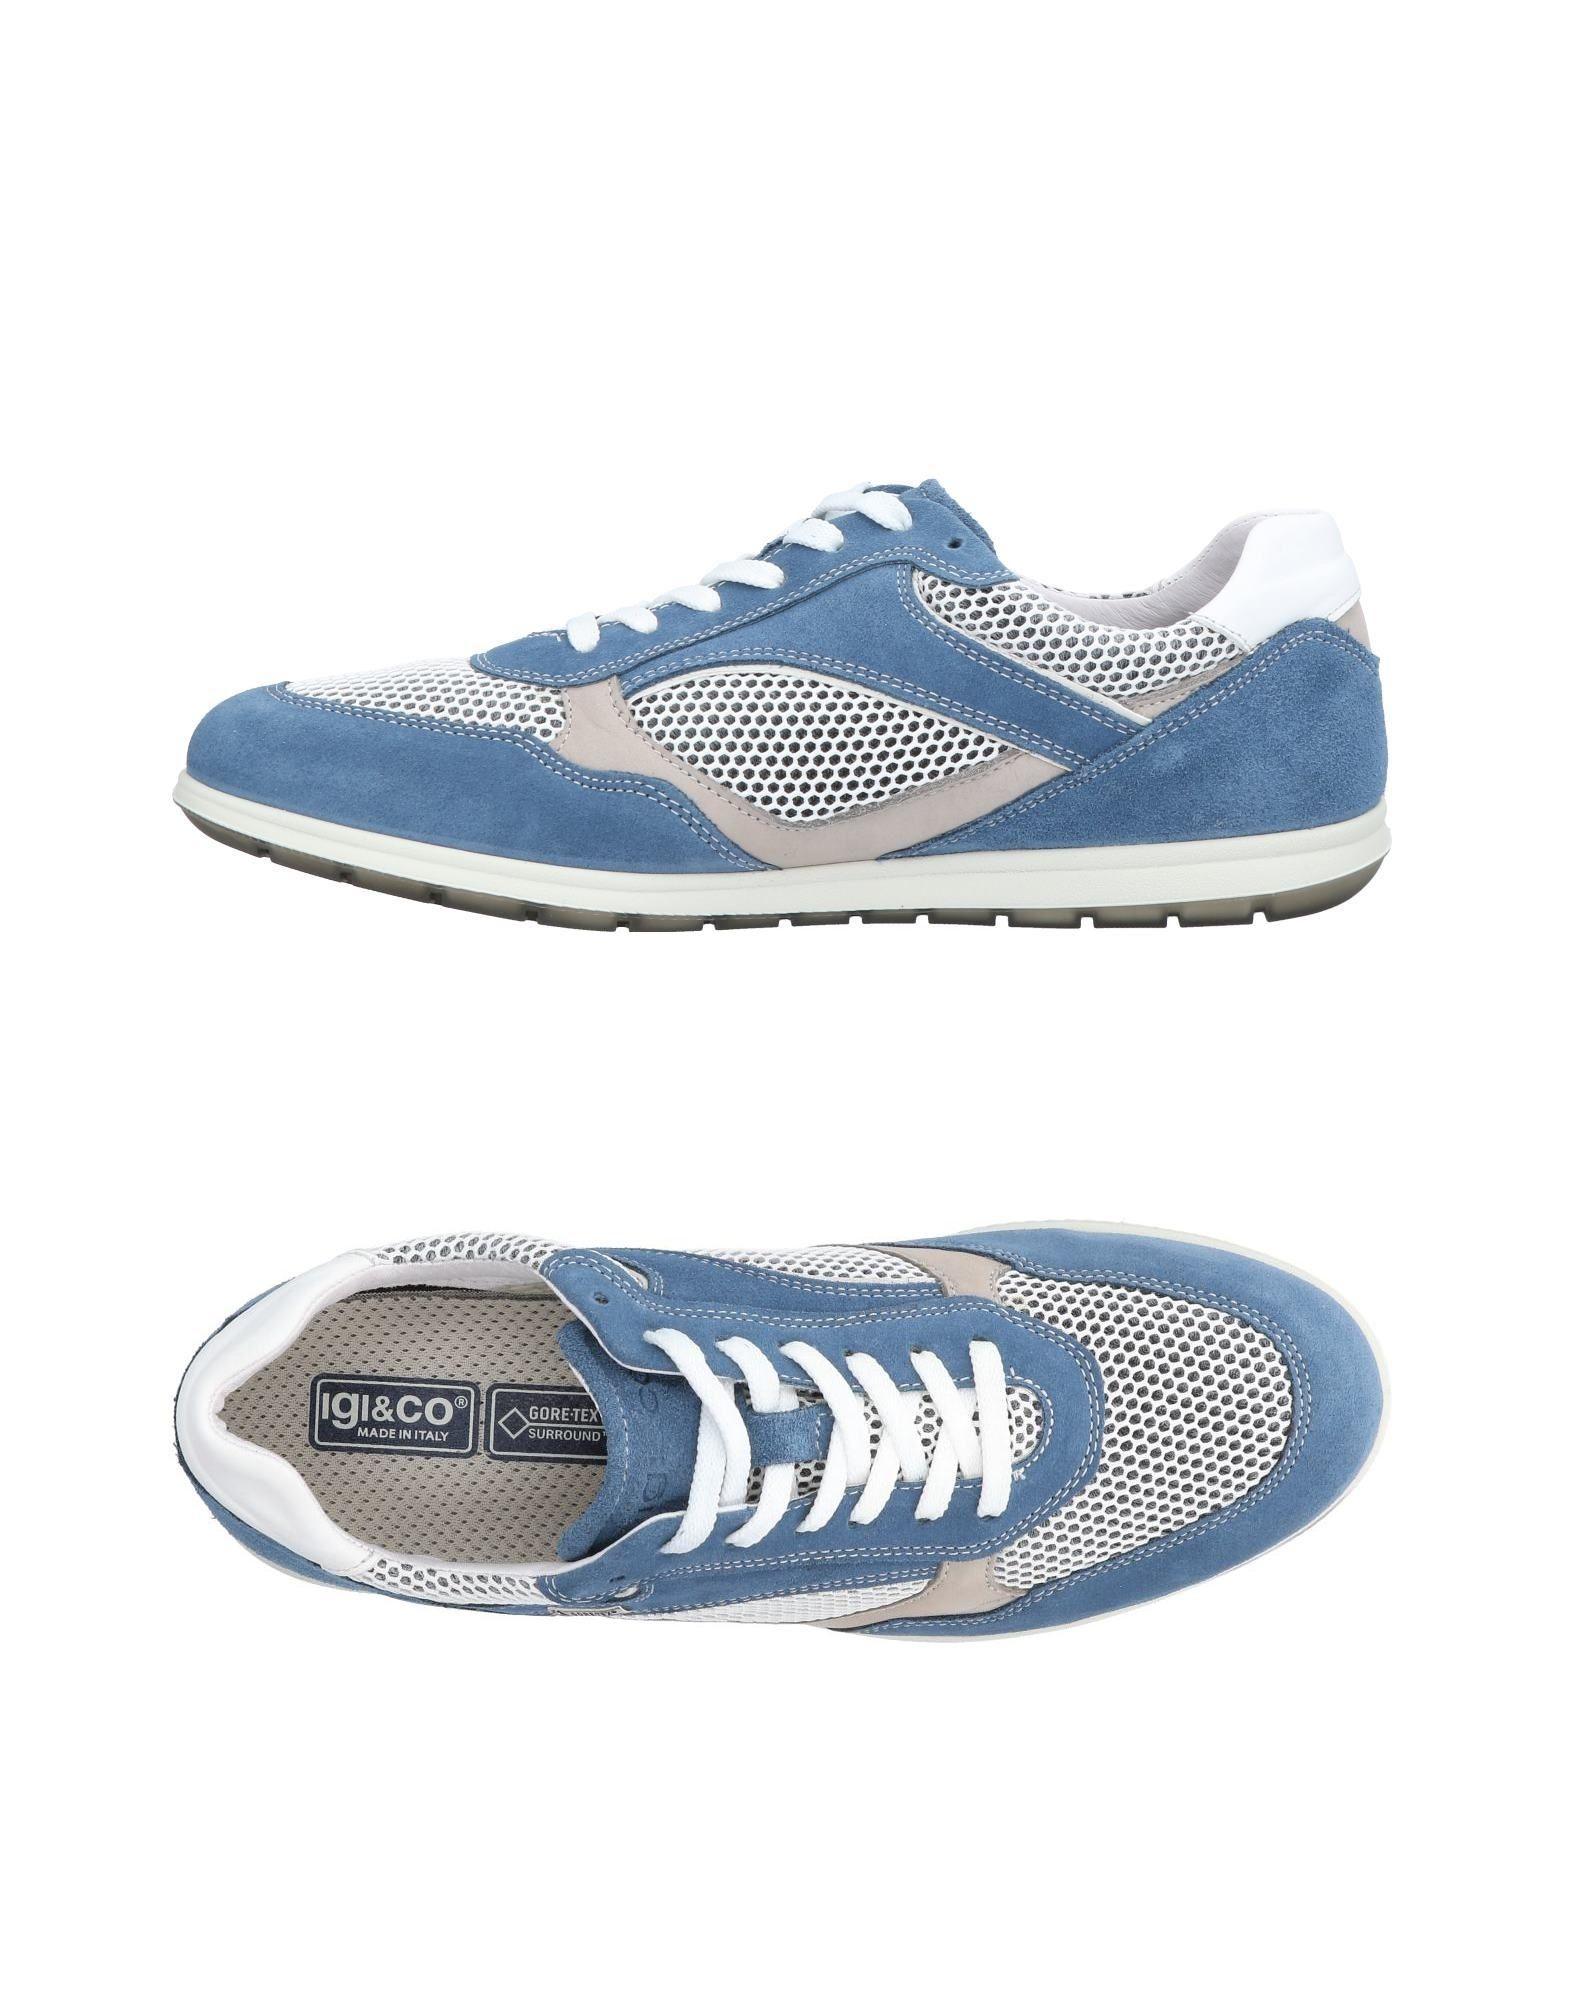 Igi&Co Sneakers - Men Igi&Co Australia Sneakers online on  Australia Igi&Co - 11463900IP 6dd089